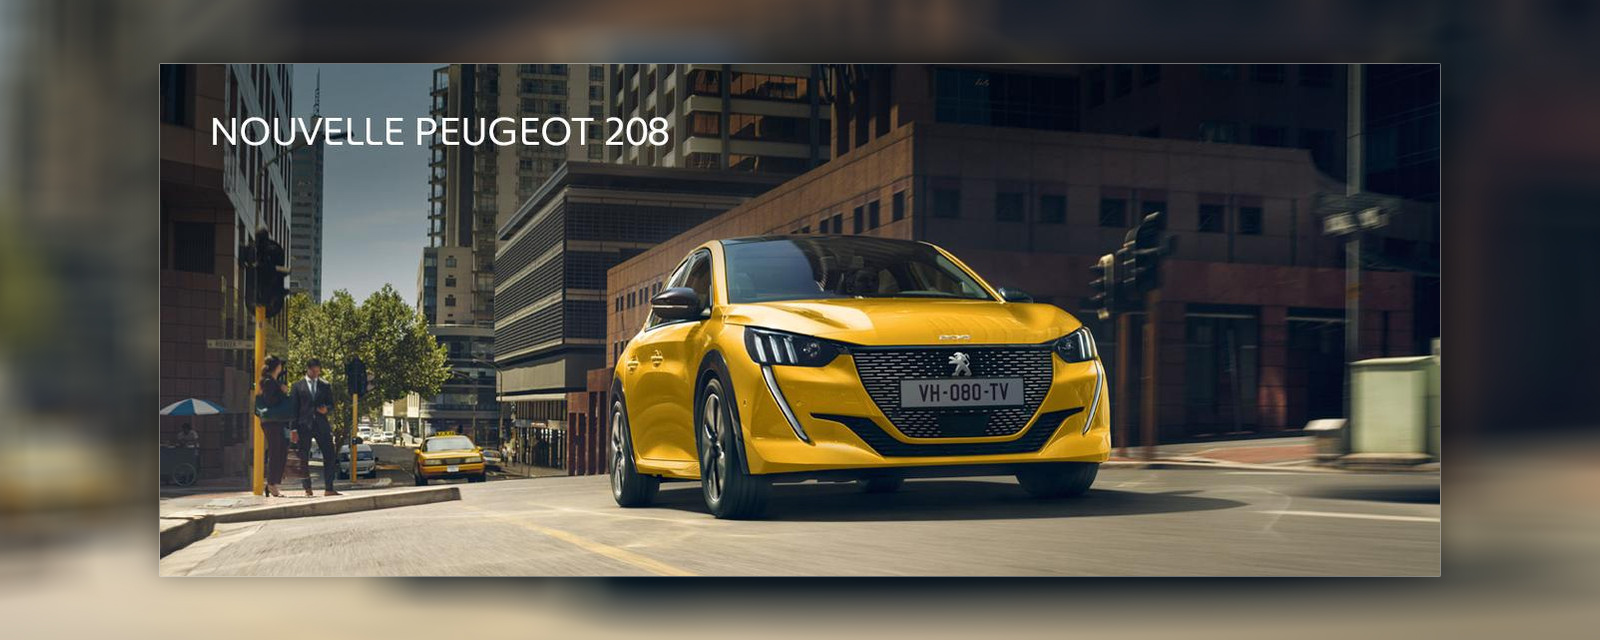 Neuer Peugeot 208